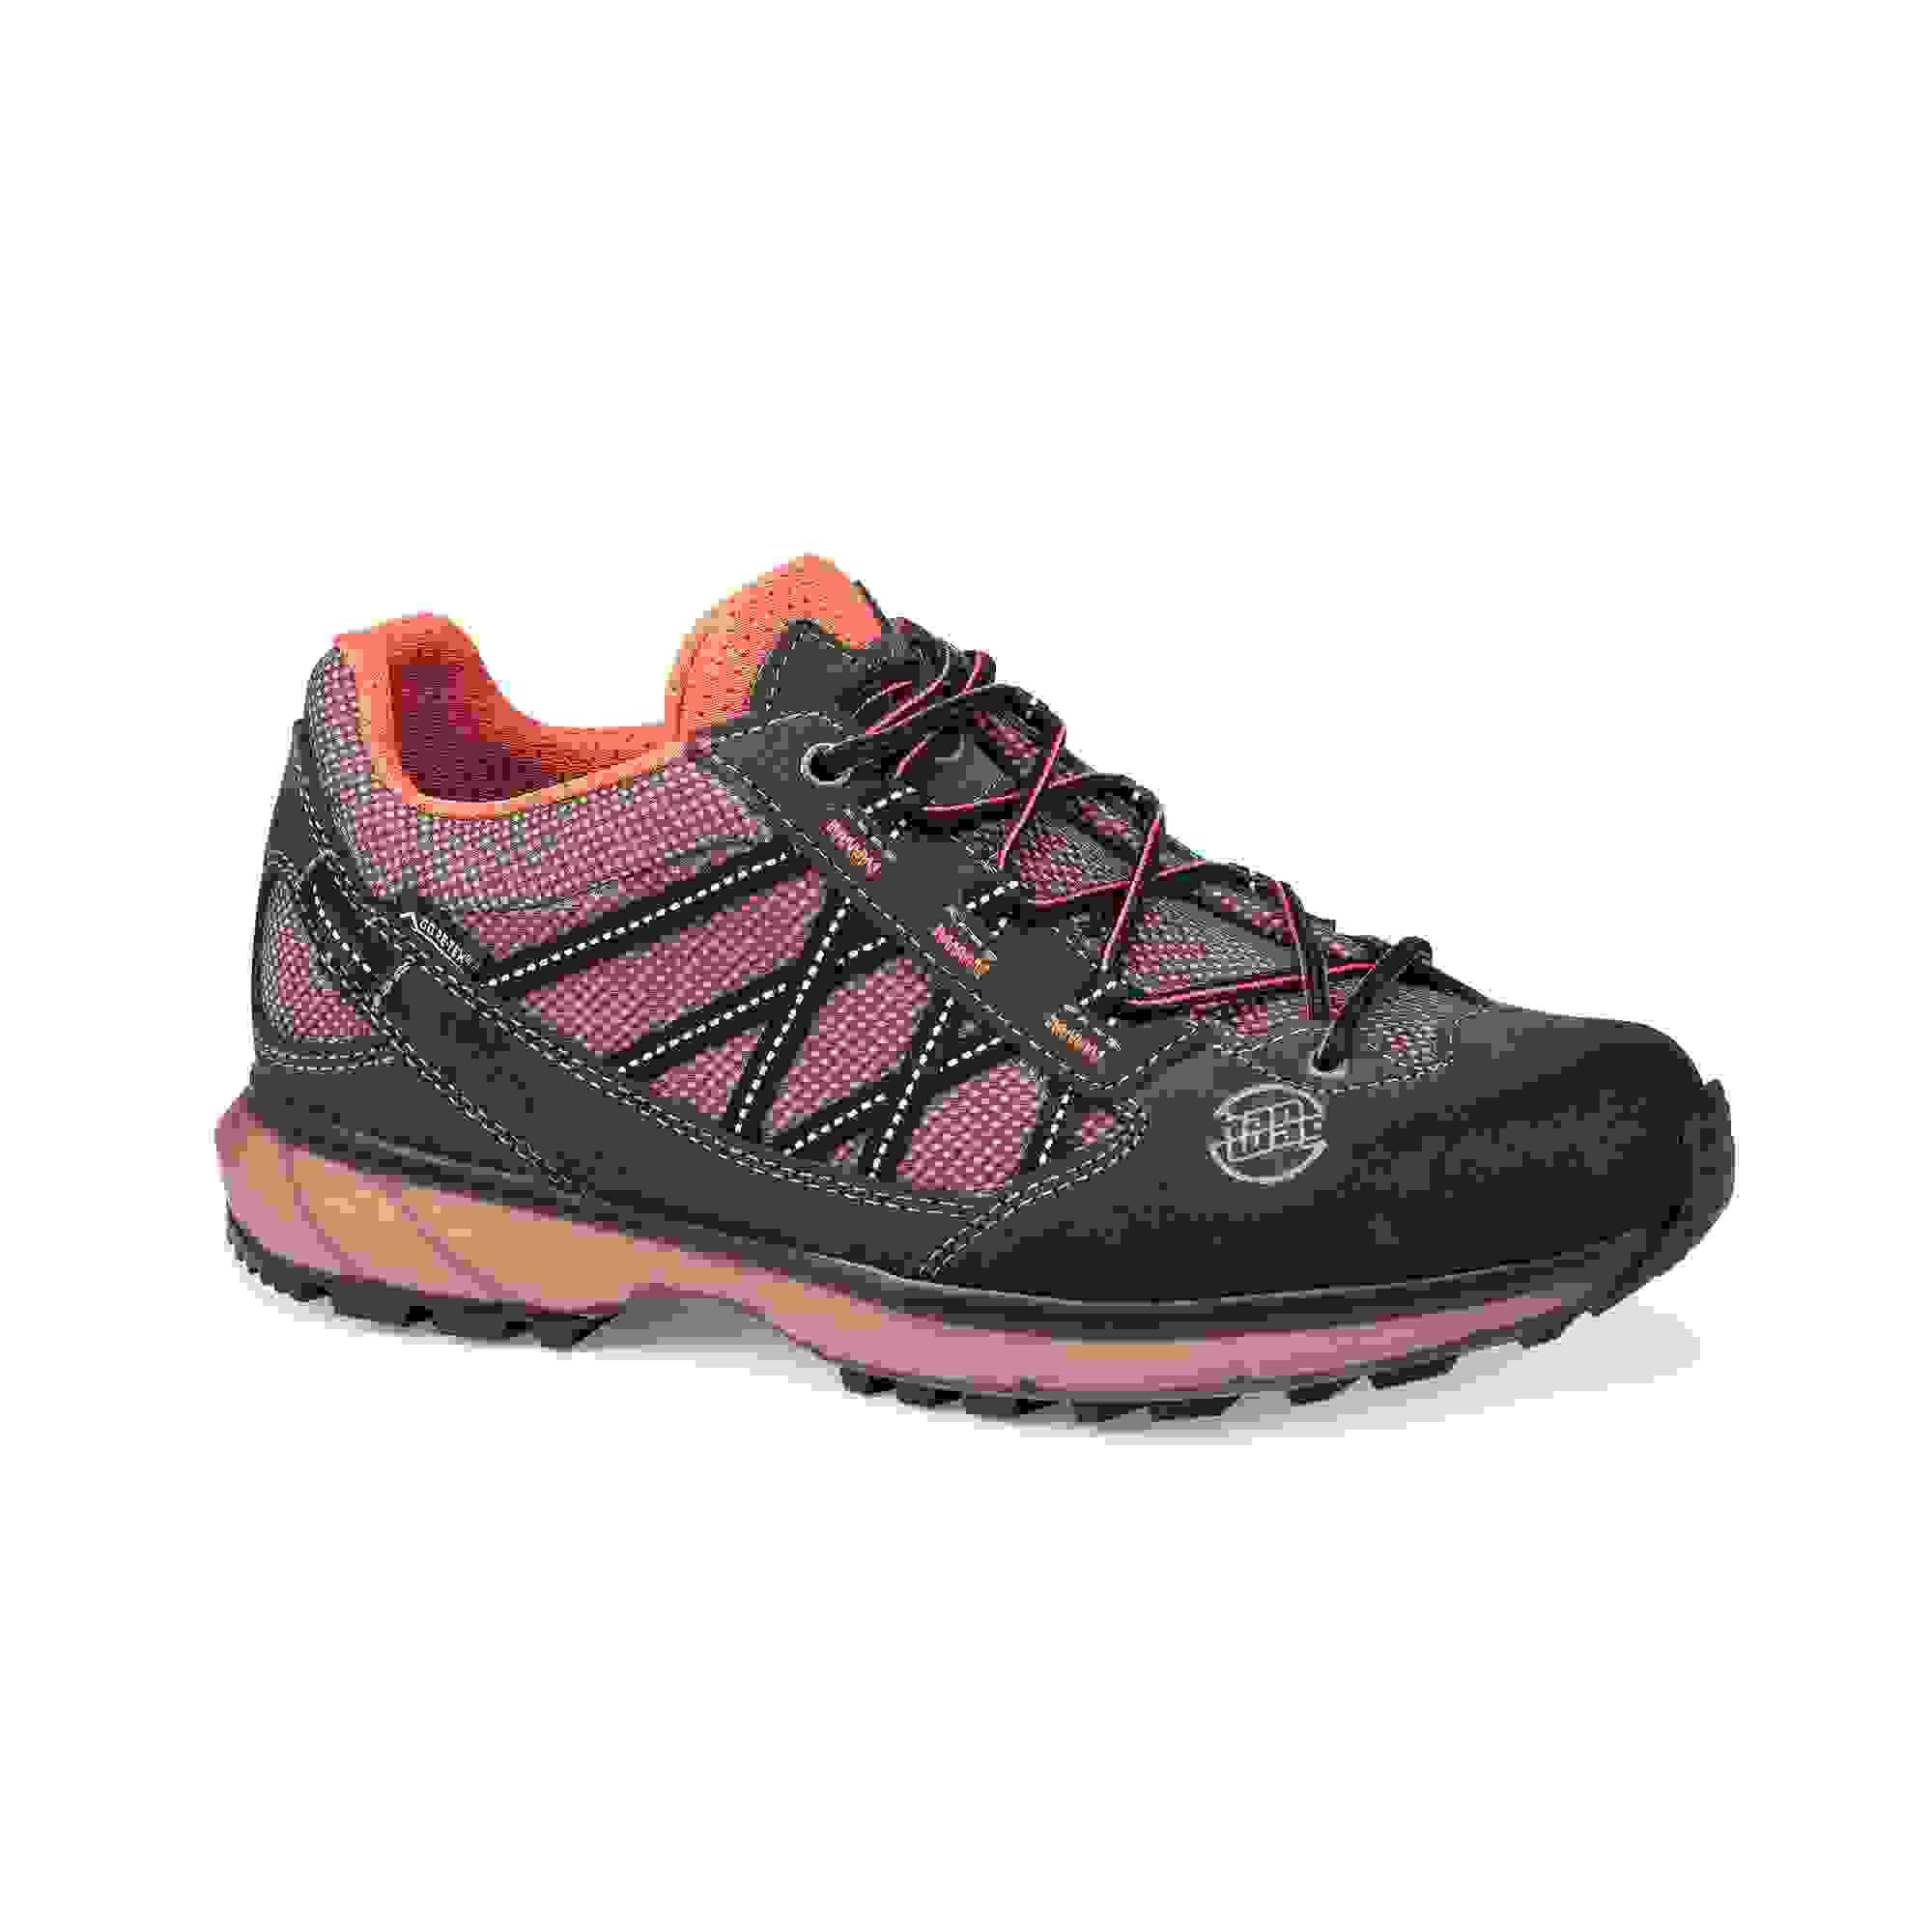 Hanwag trekking zapatos Belorado 2 tubetec GTX outdoorschuhe botín de senderisml